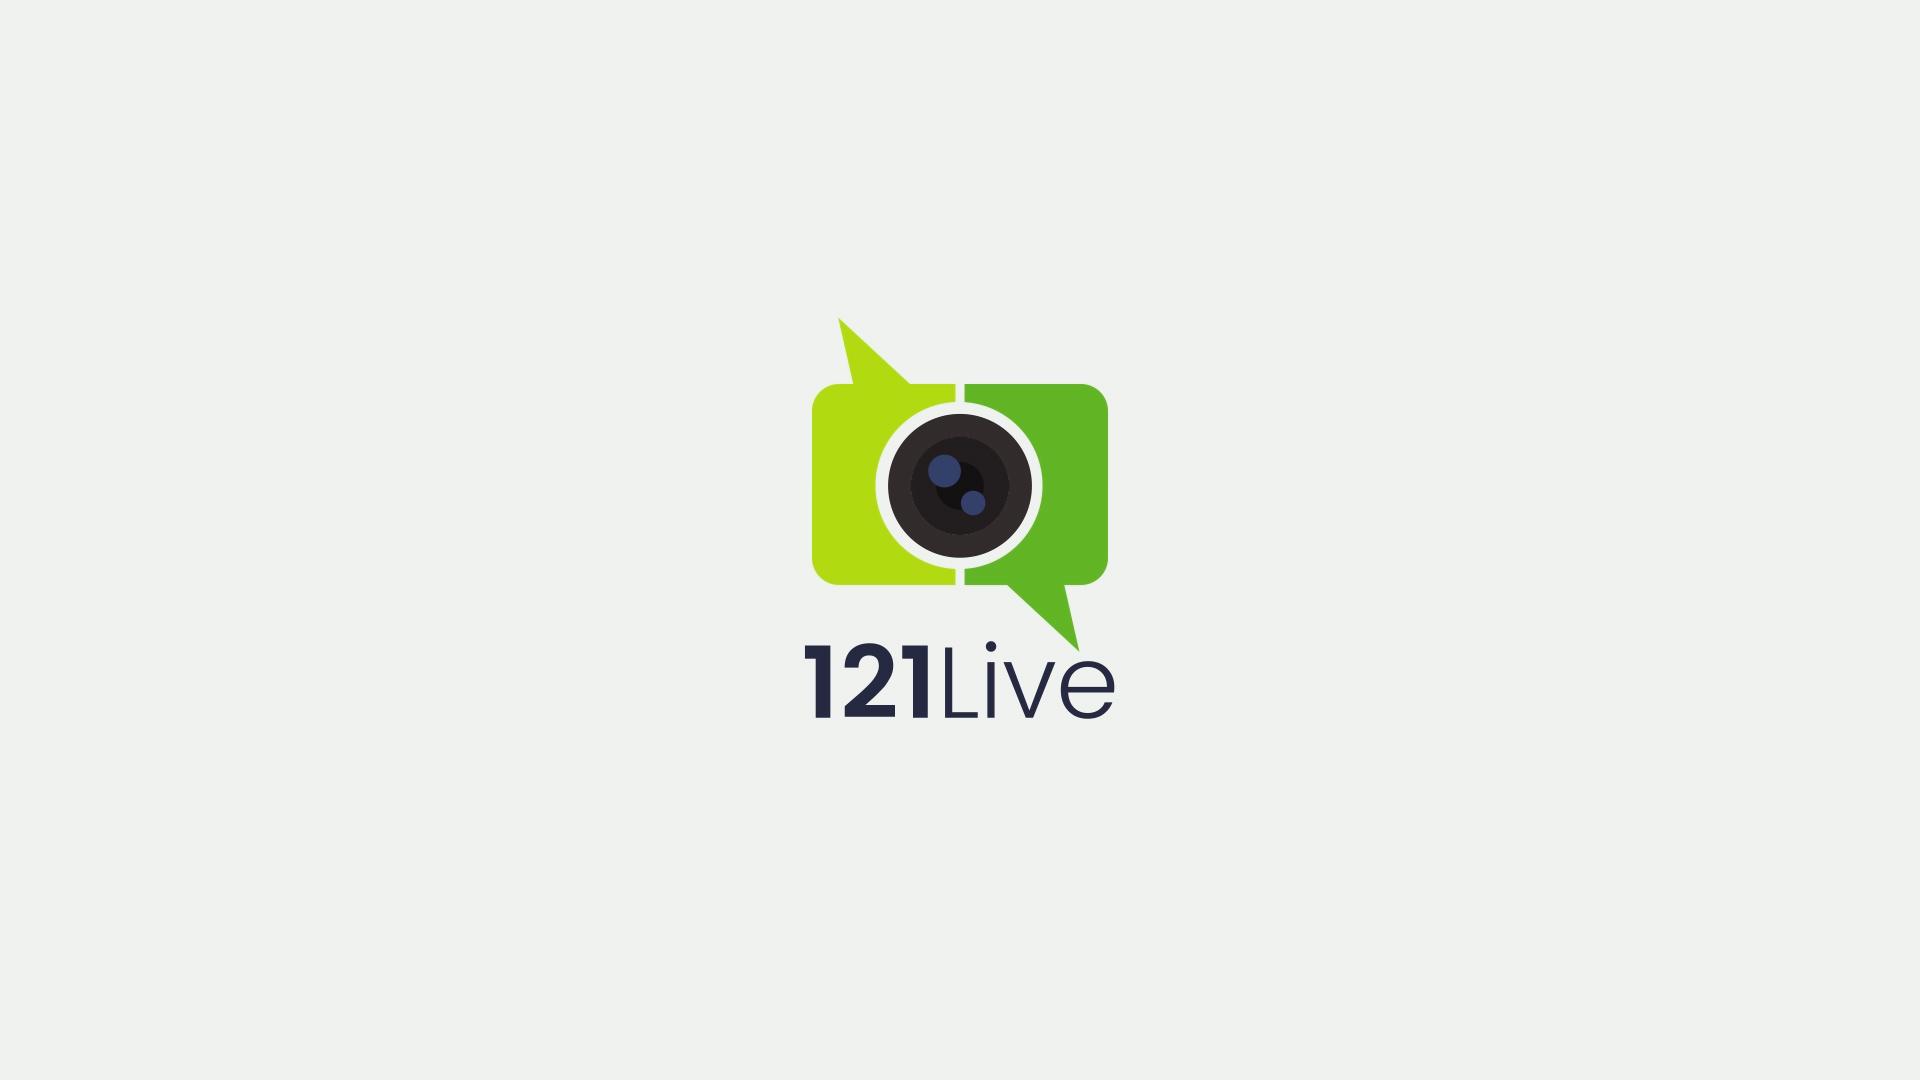 The 121 Live logo